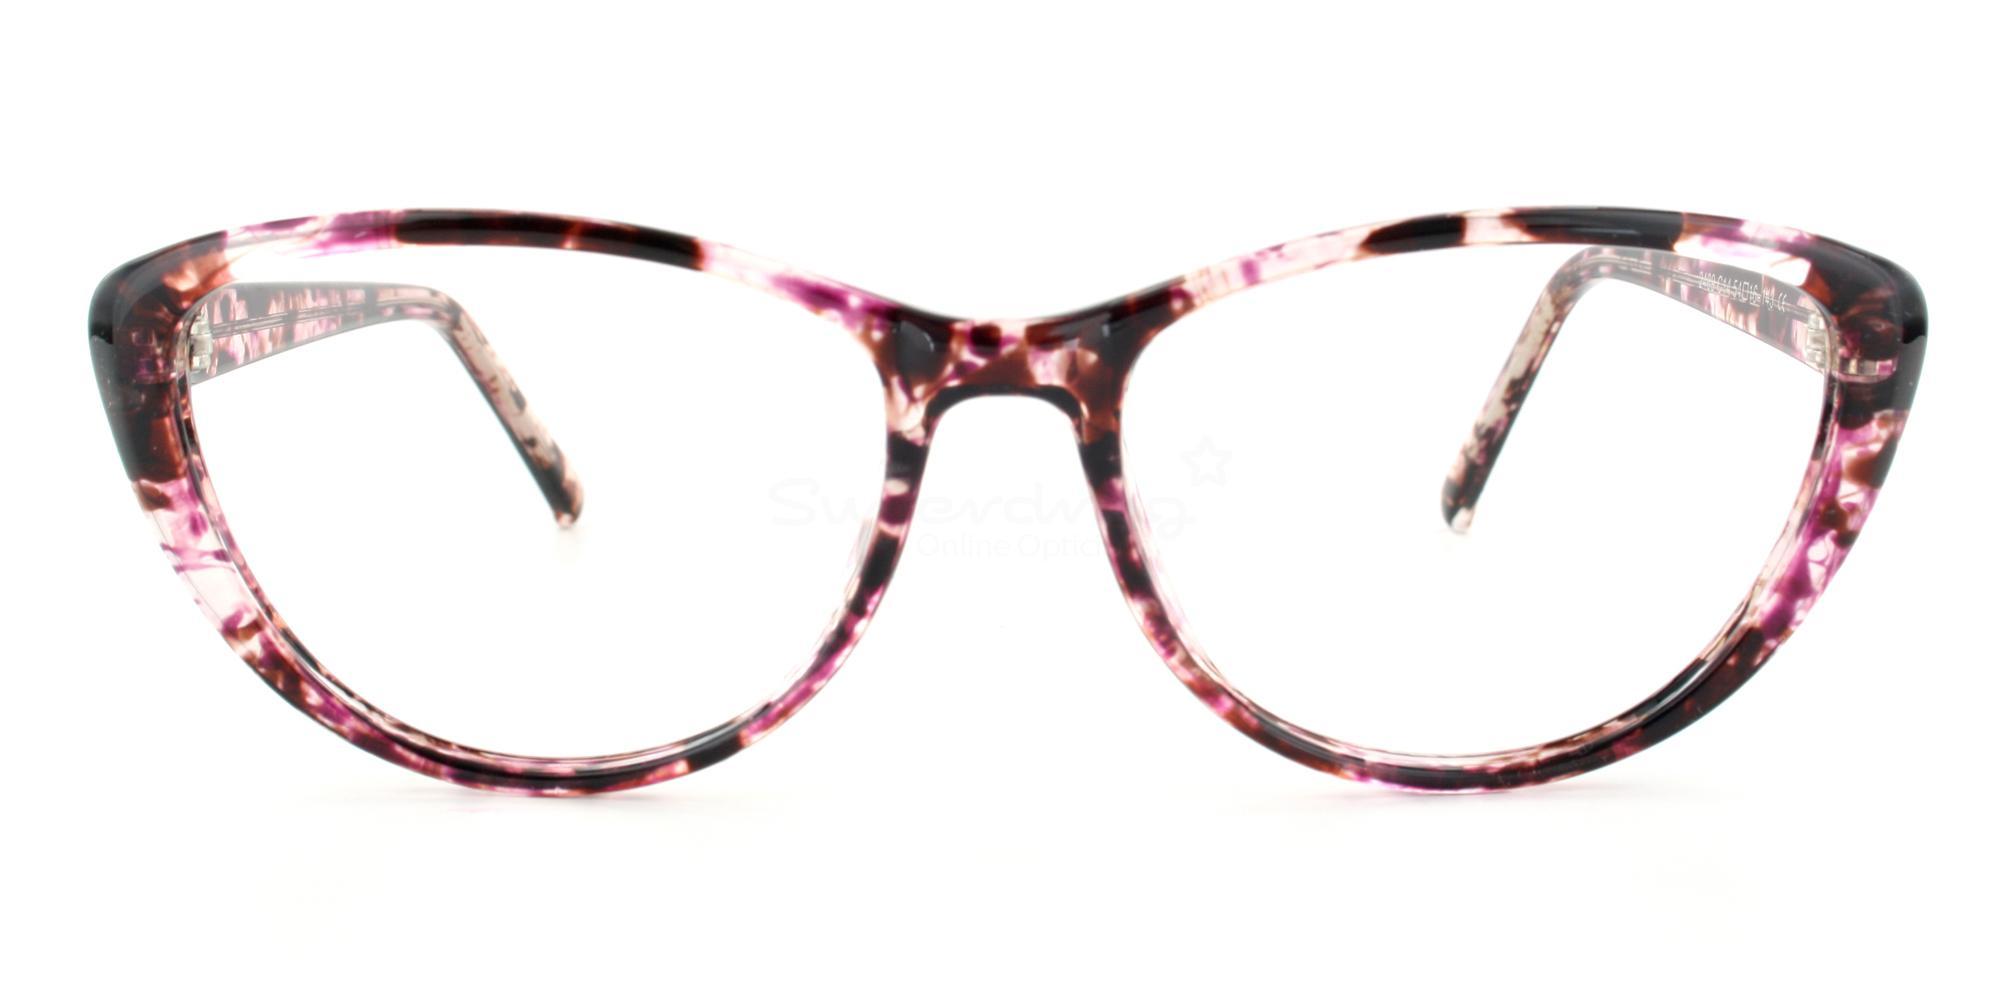 C14 2489 - Pink Demi Glasses, Helium